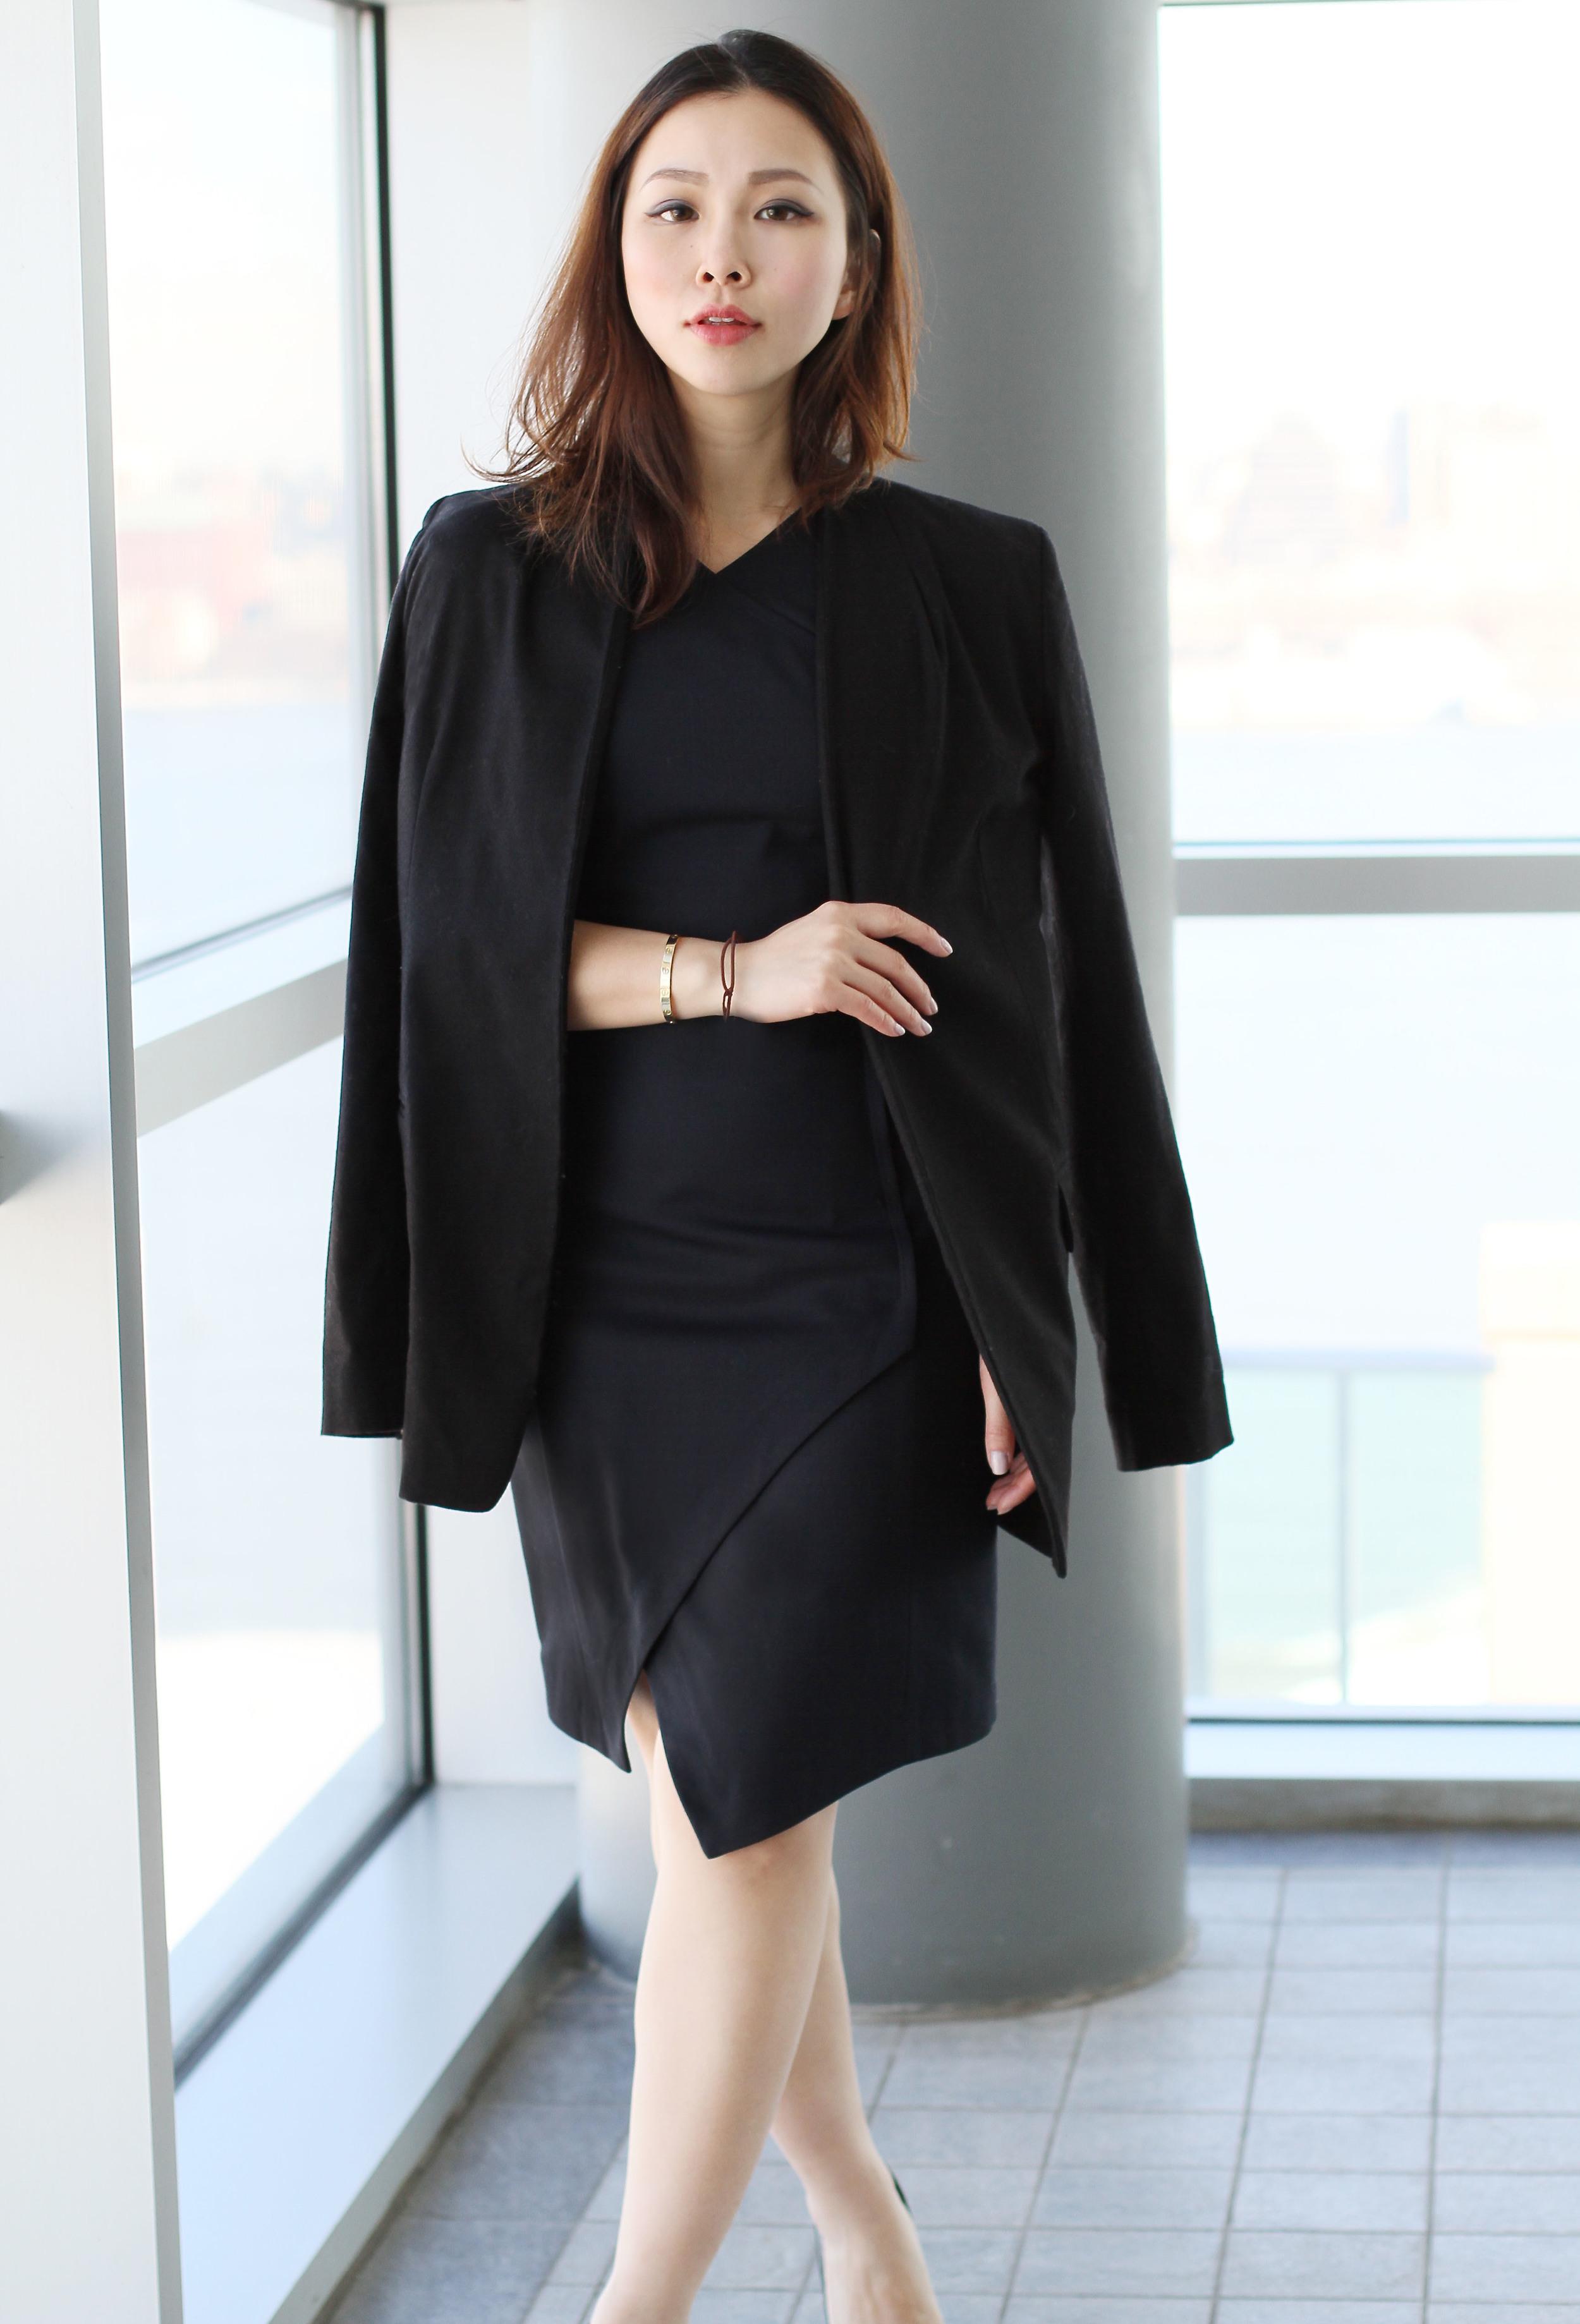 onepointsix office dress1.jpg